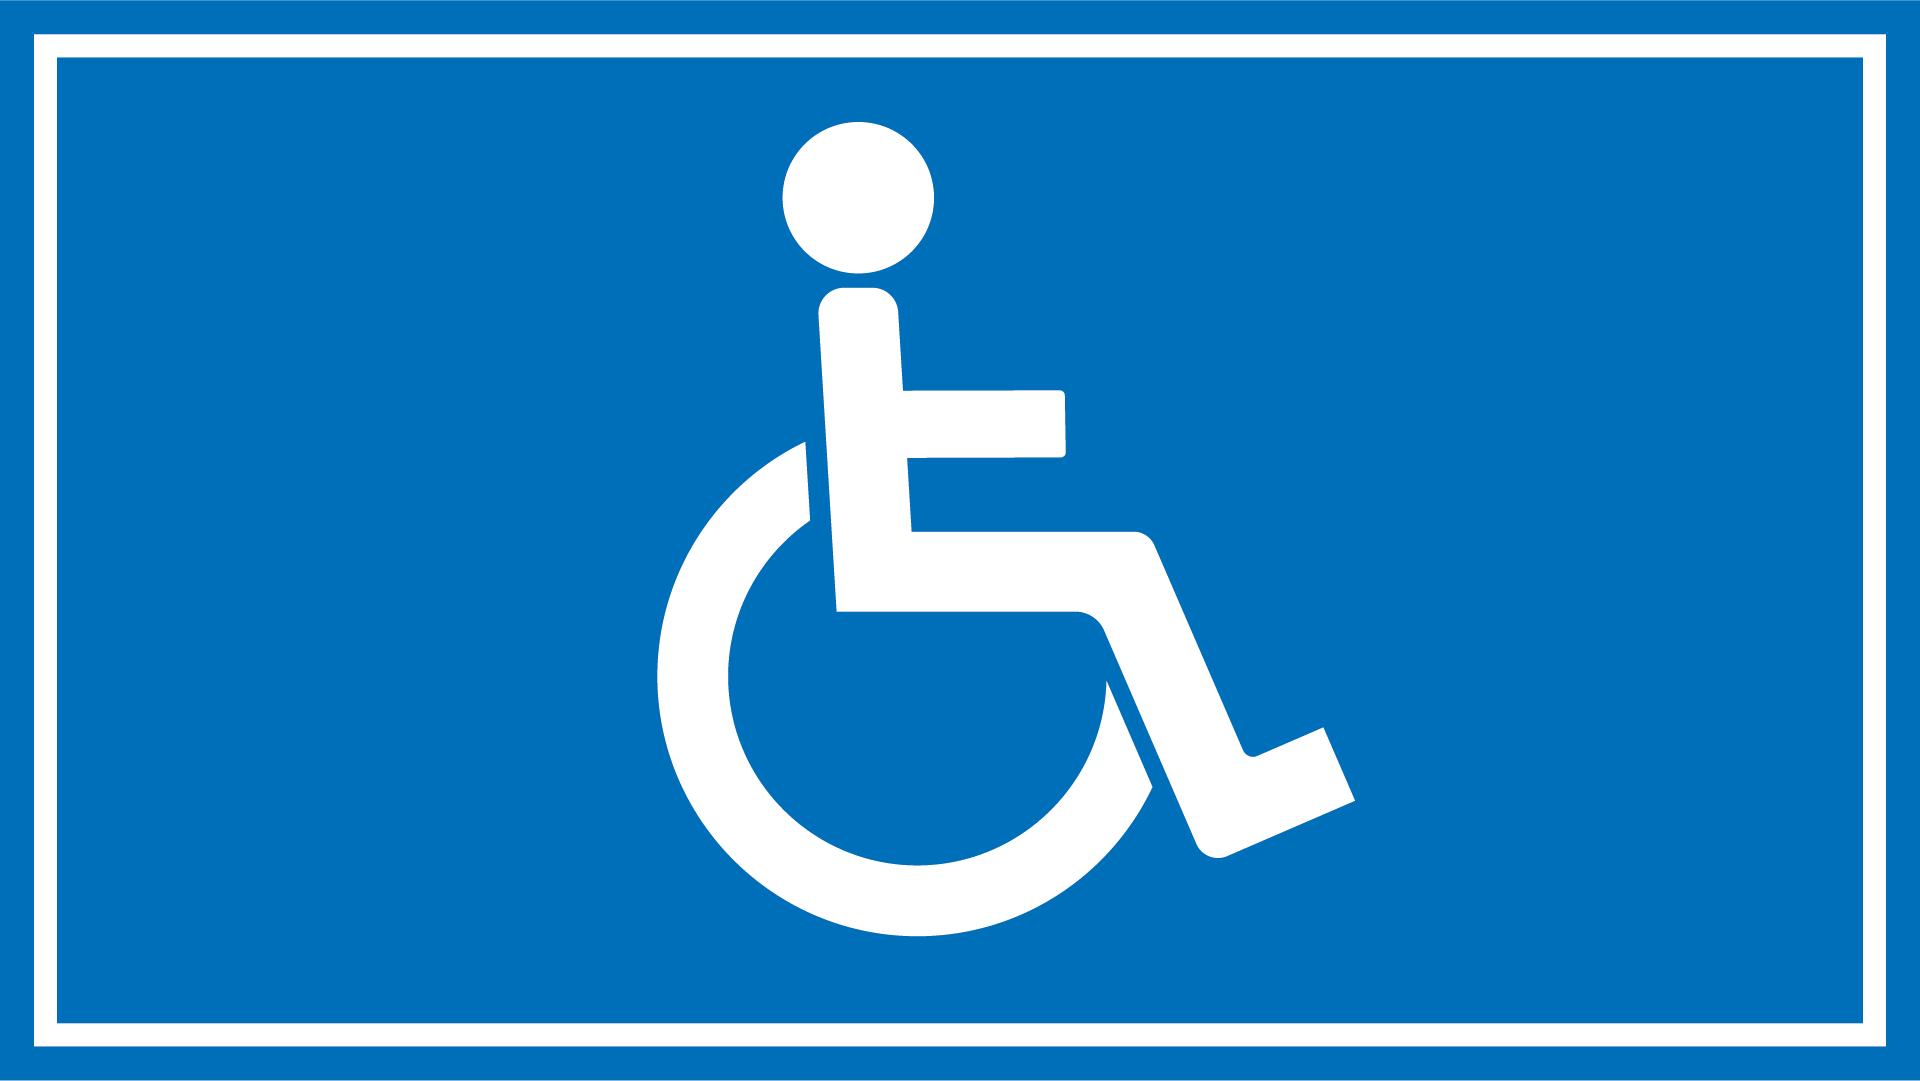 https://www.virginiaaquarium.com/assets/Images/PlanVisit/Directions-Parking/Accessibility-1.png